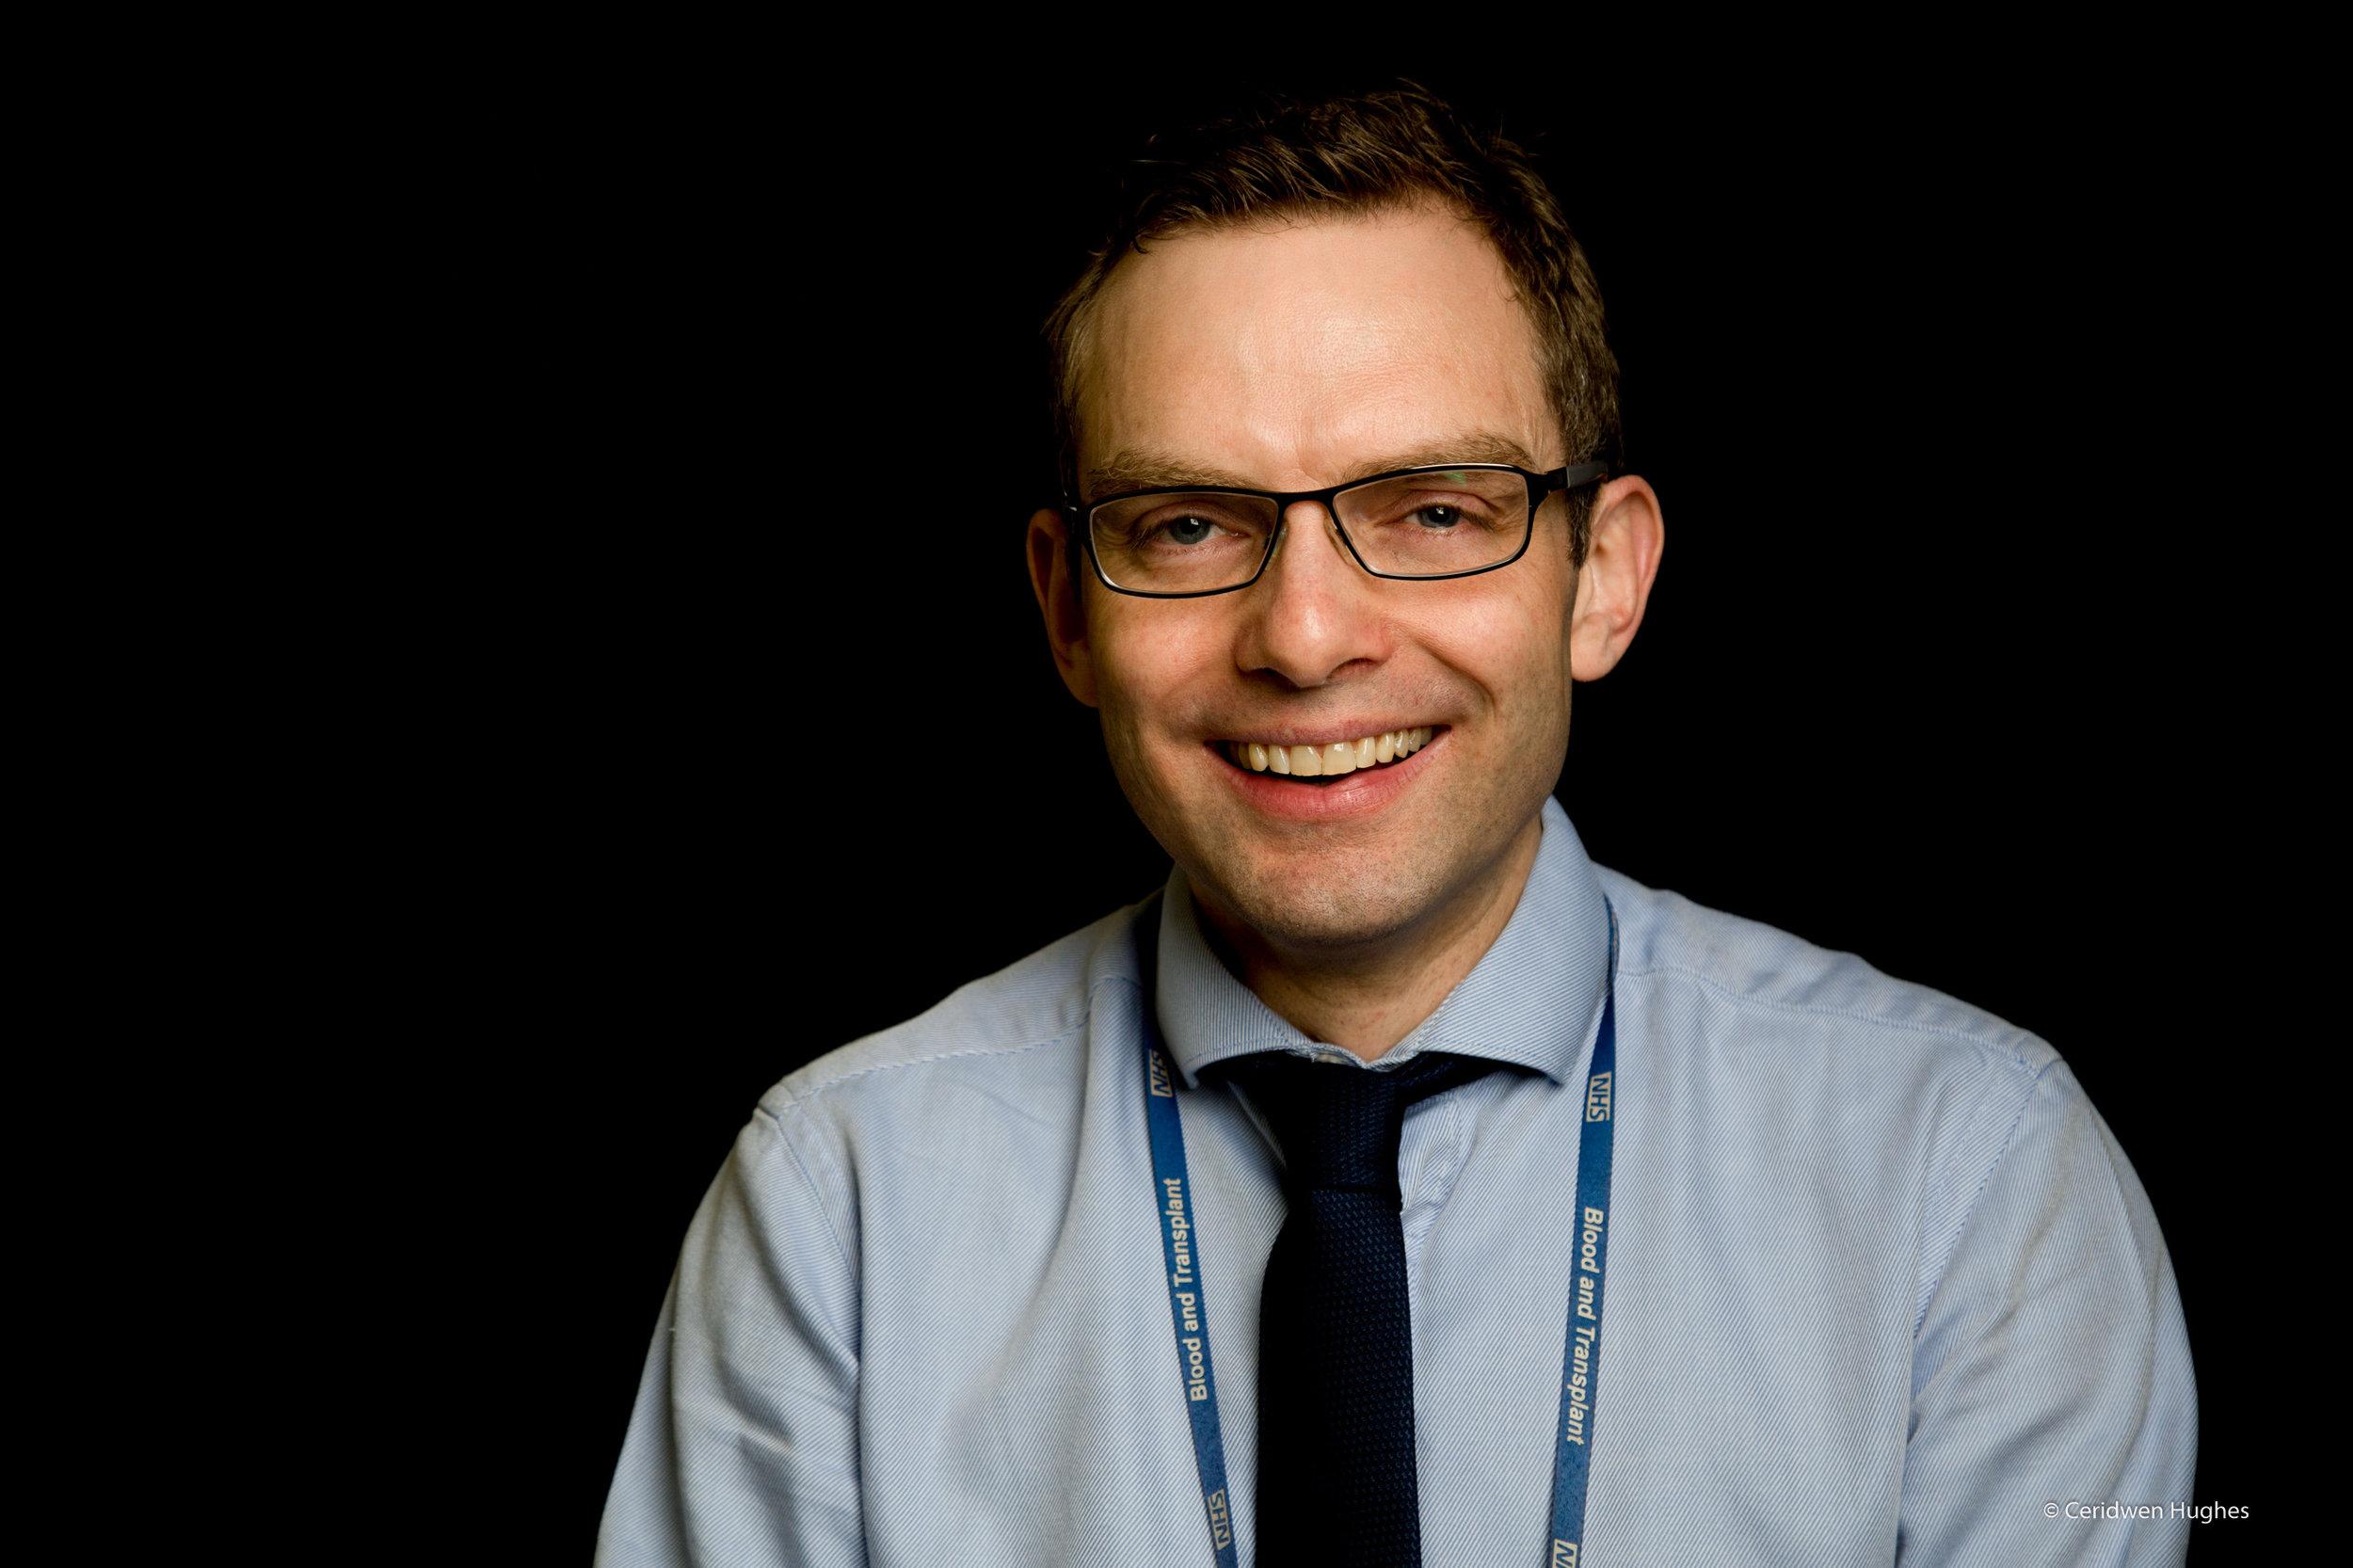 James Taylor Lab manager at Birmingham Children's Hospital